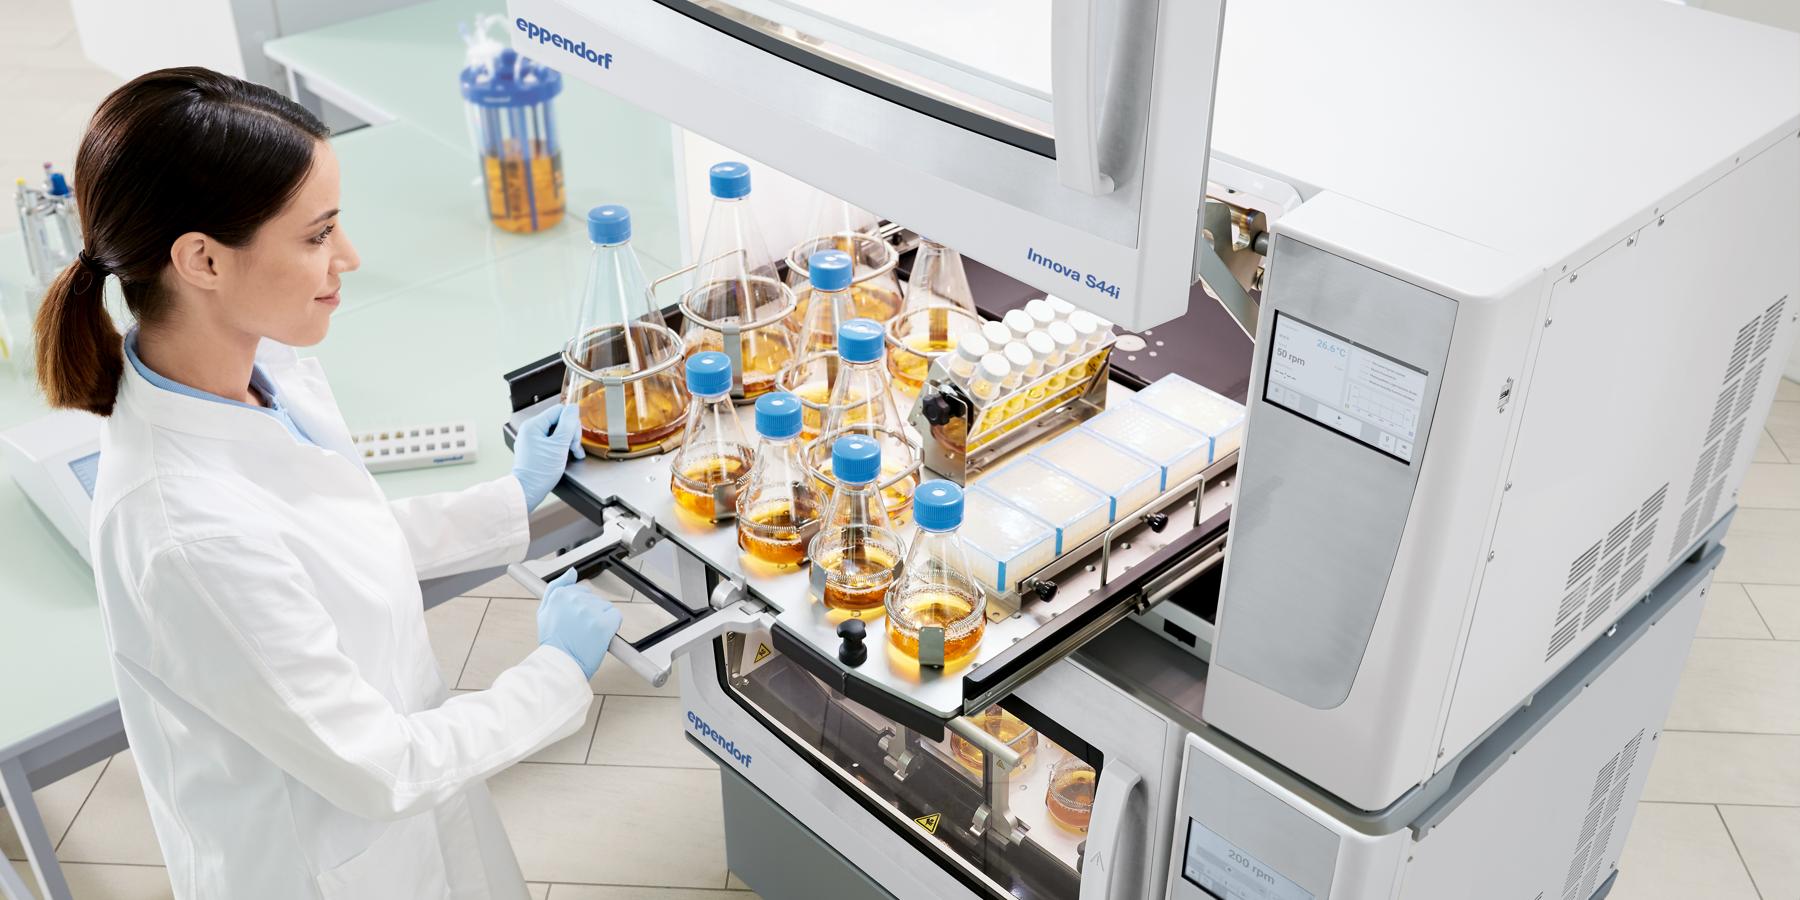 How Bioreactor Inoculum Preparation in Shake Flasks with Automated Inoculation Works